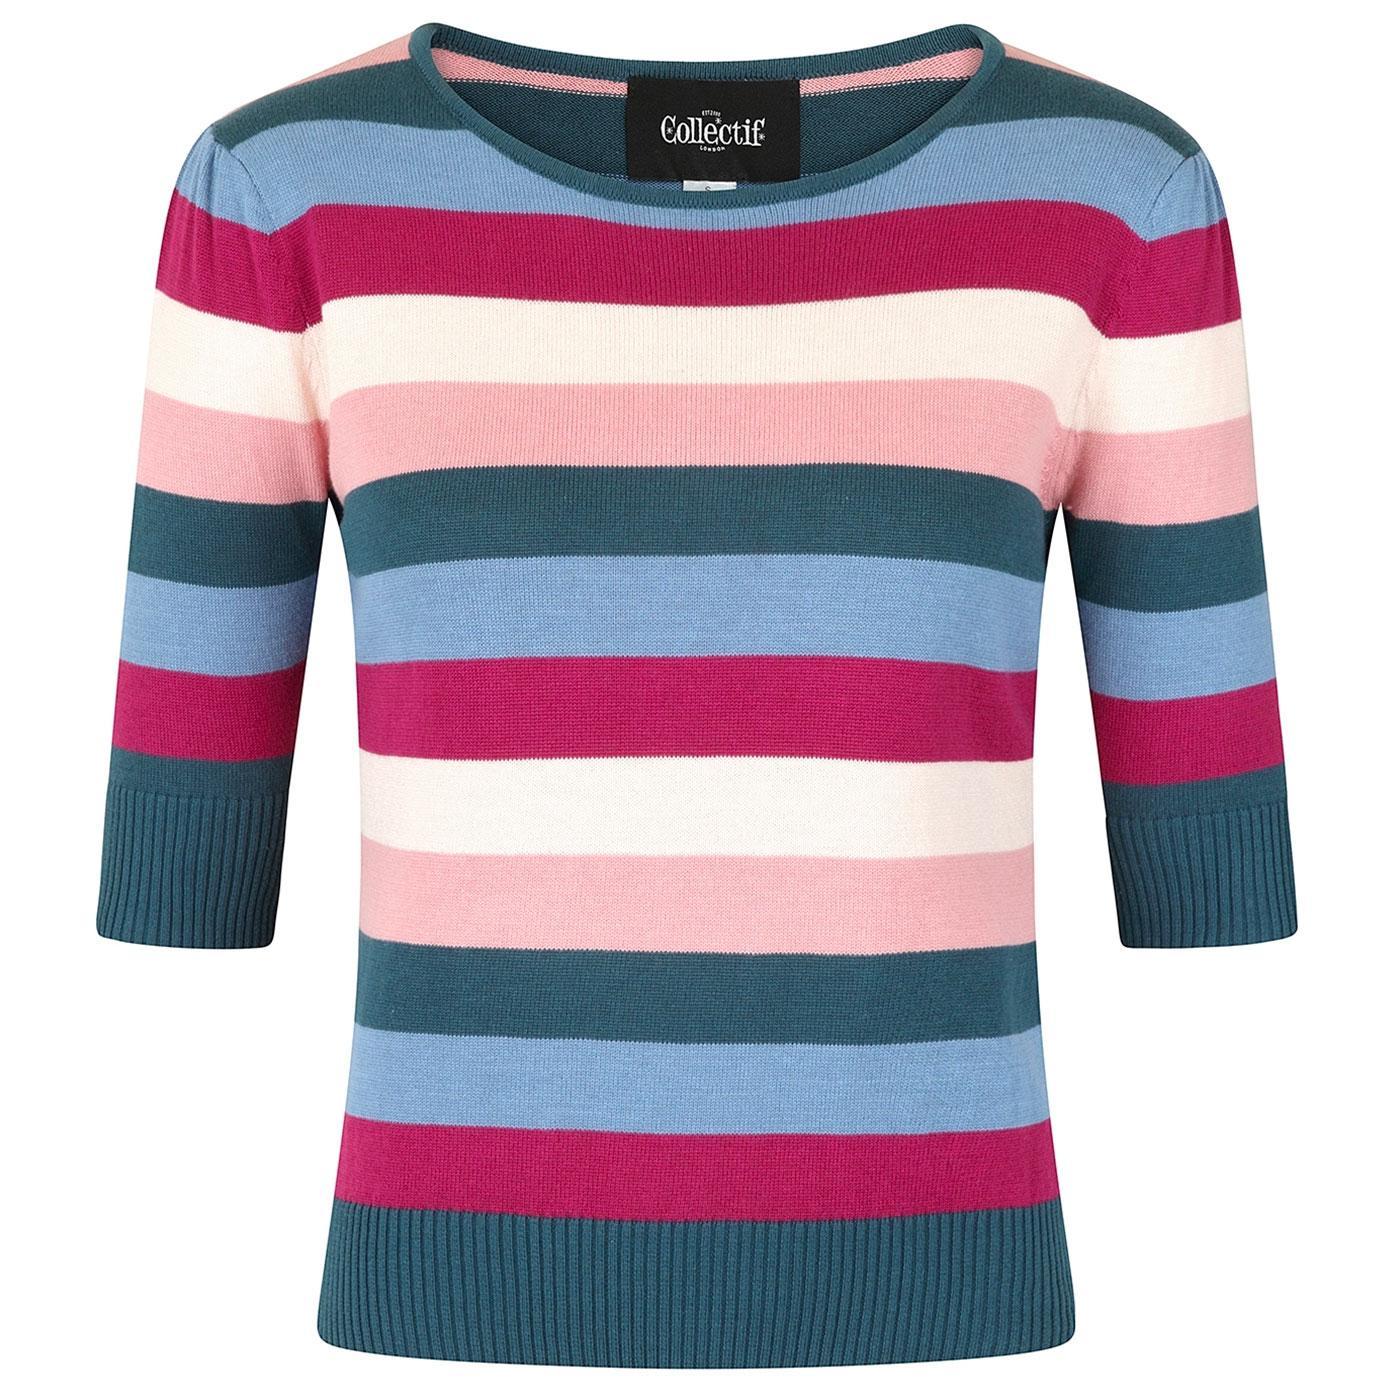 Chrissie COLLECTIF Retro Paradise Stripe Knit Top